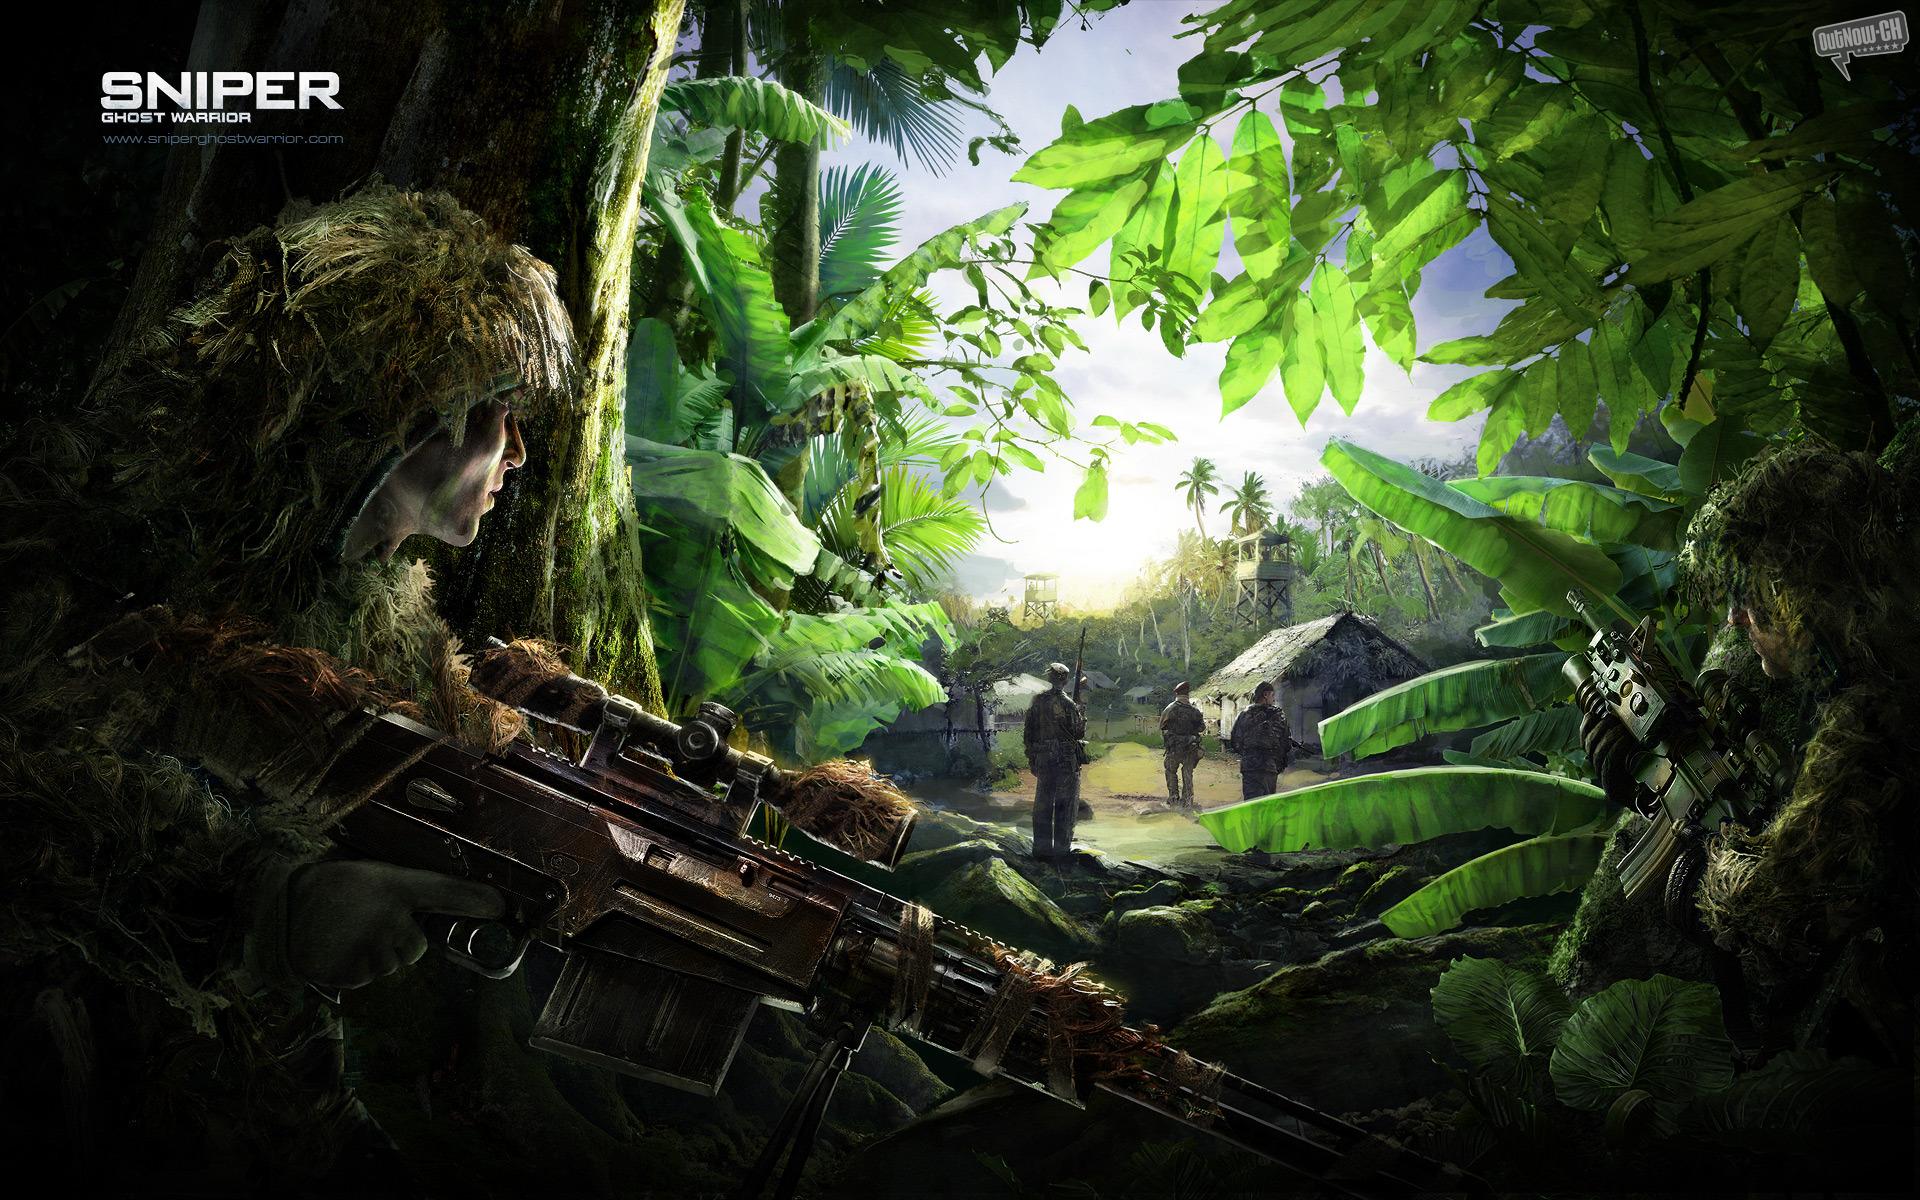 Sniper Ghostwarrior wallpapers Sniper Ghostwarrior stock photos 1920x1200